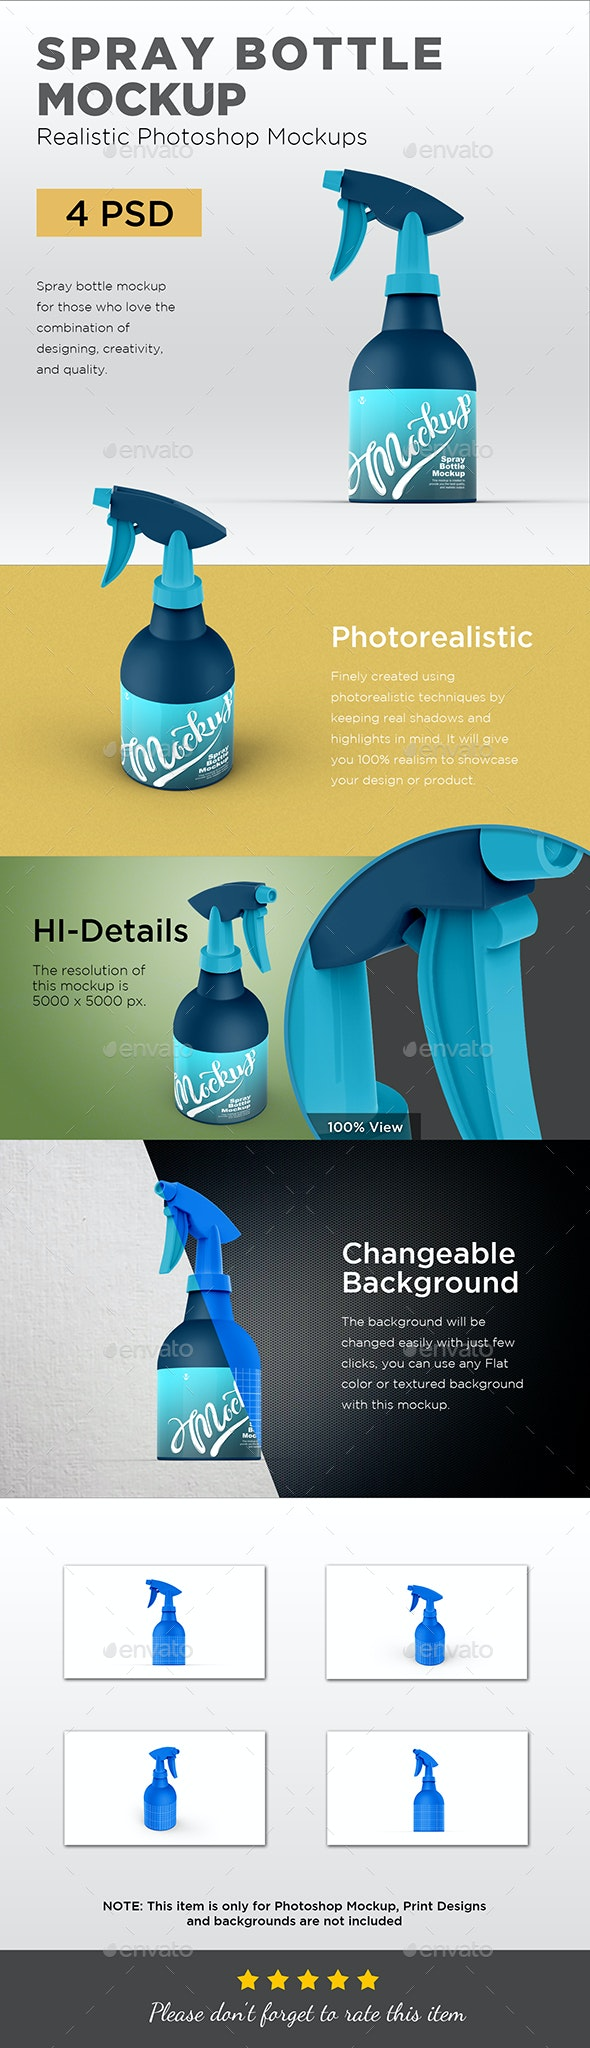 Plastic Spray Bottle Mockup - Product Mock-Ups Graphics